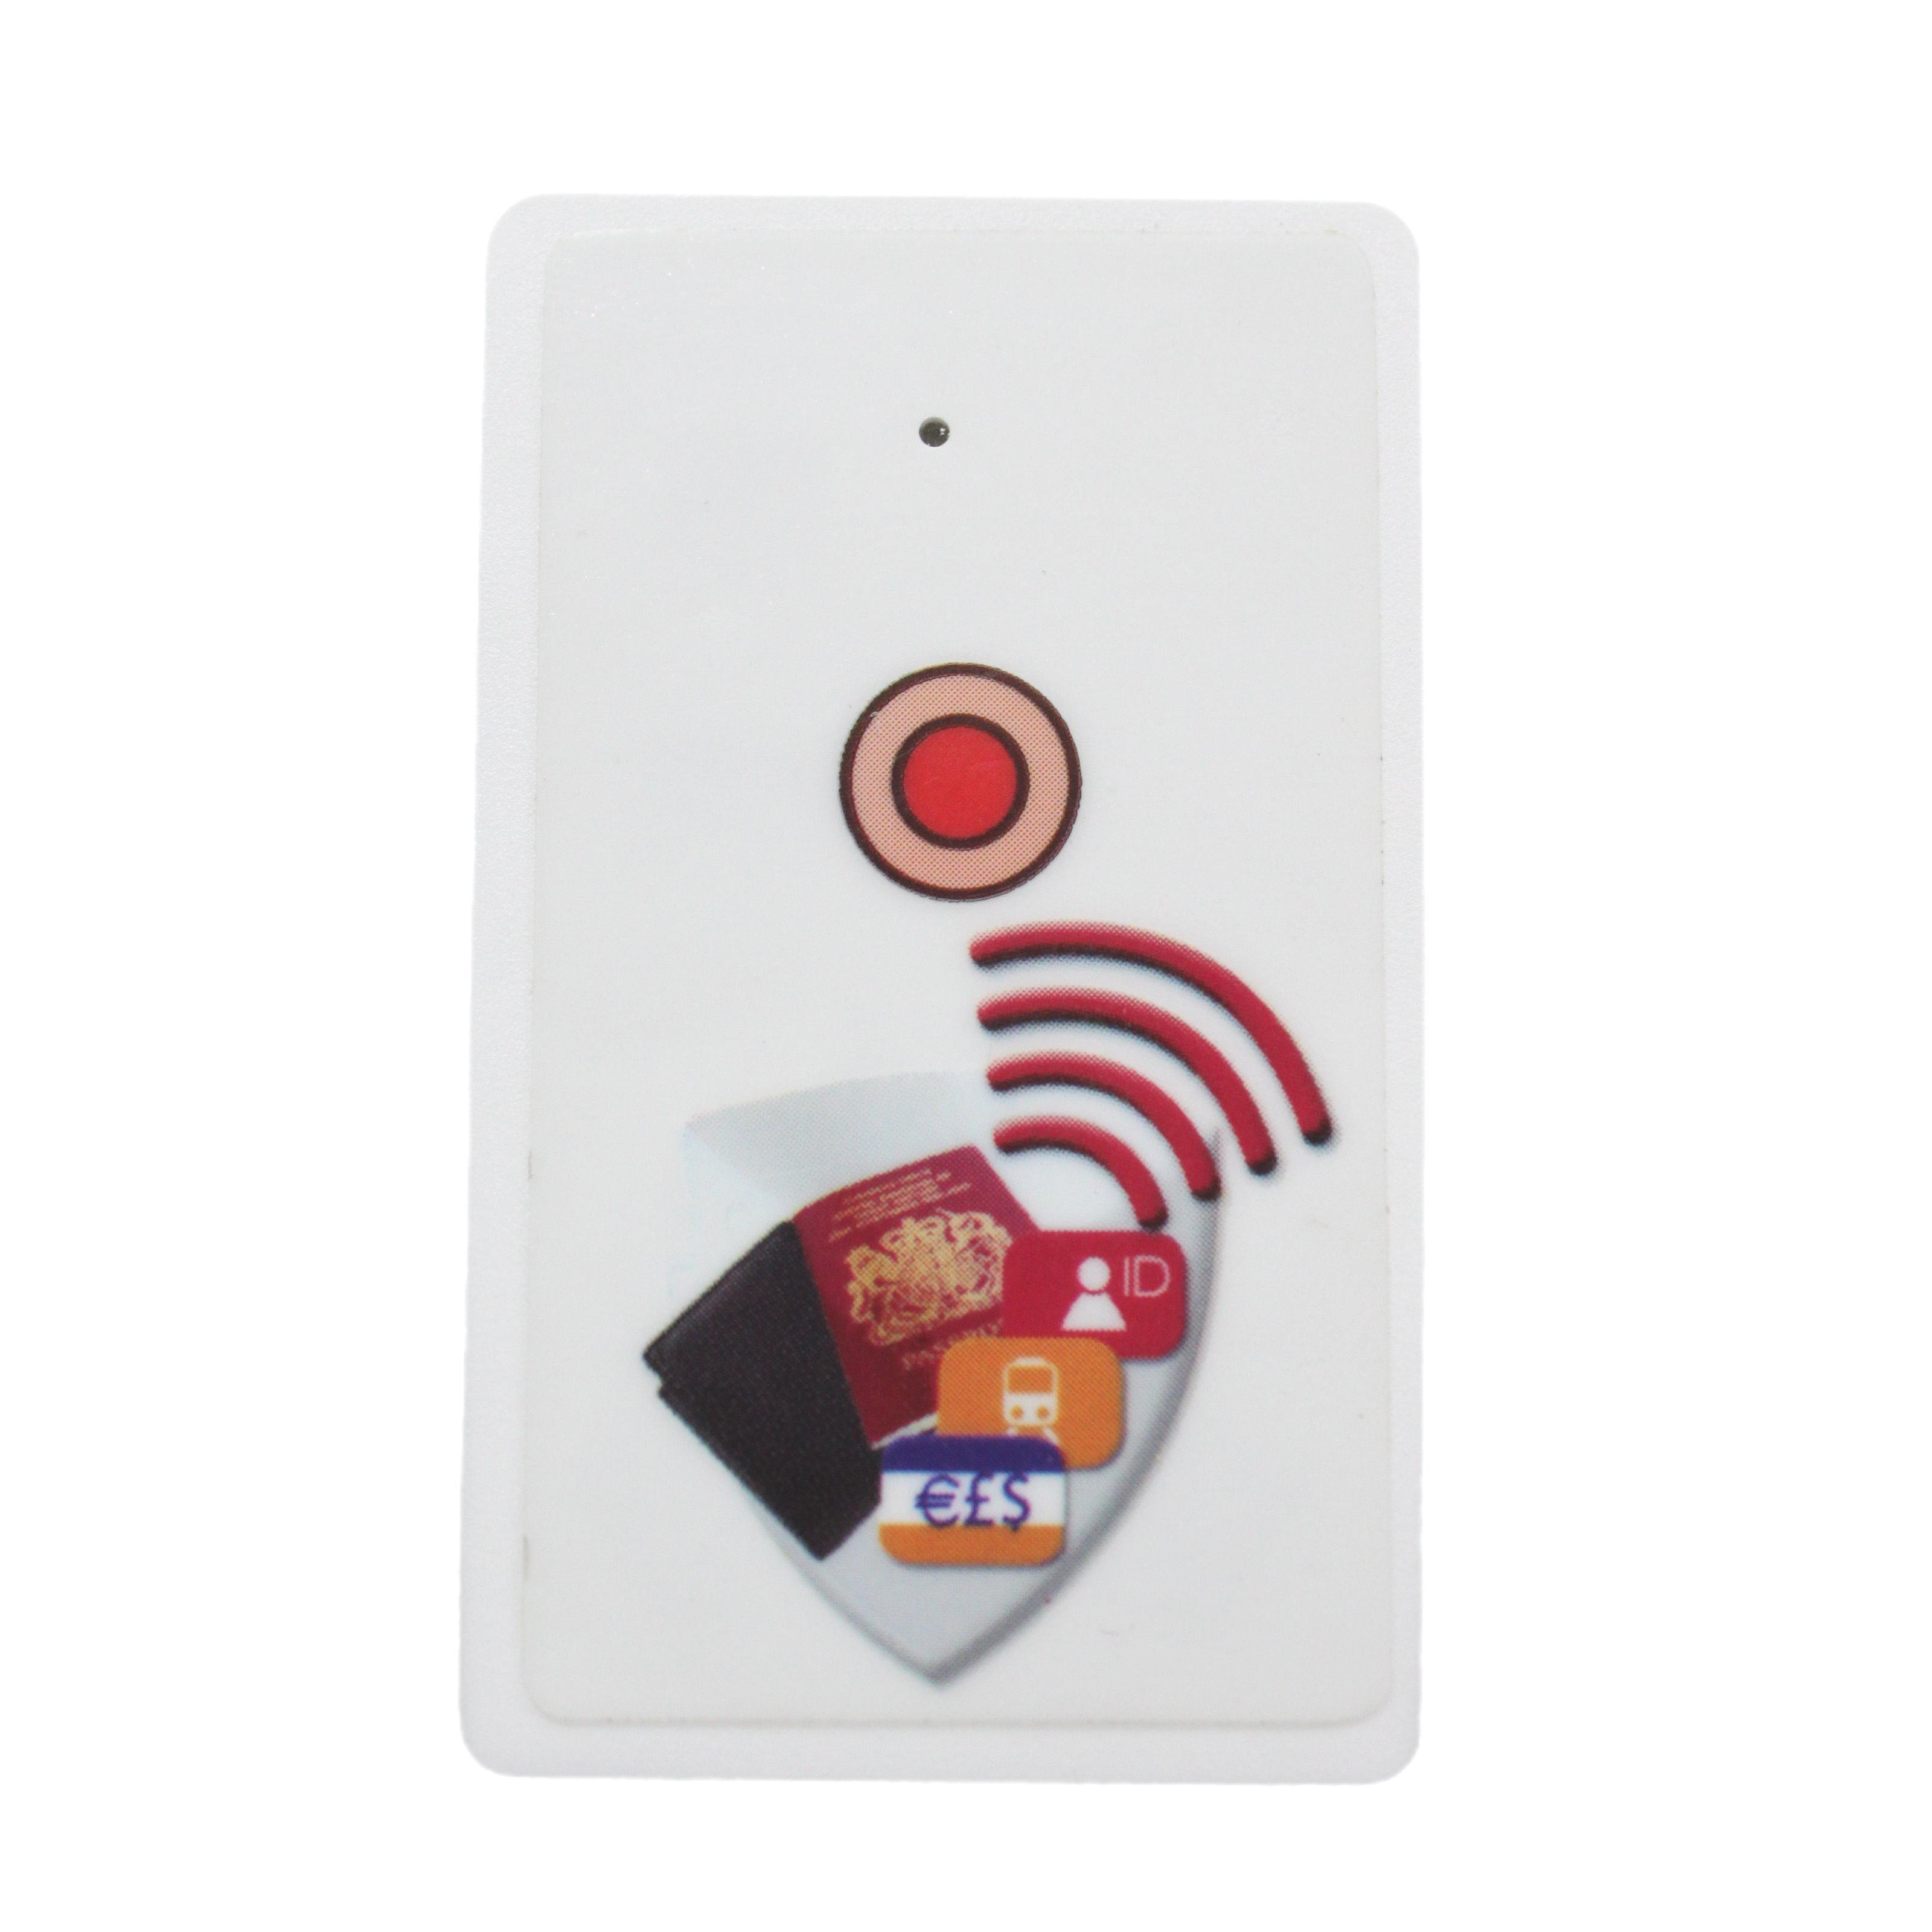 Taiwan Bluetooth Tag_Wallet Reminder   ARDI TECHNOLOGY CORPORATION